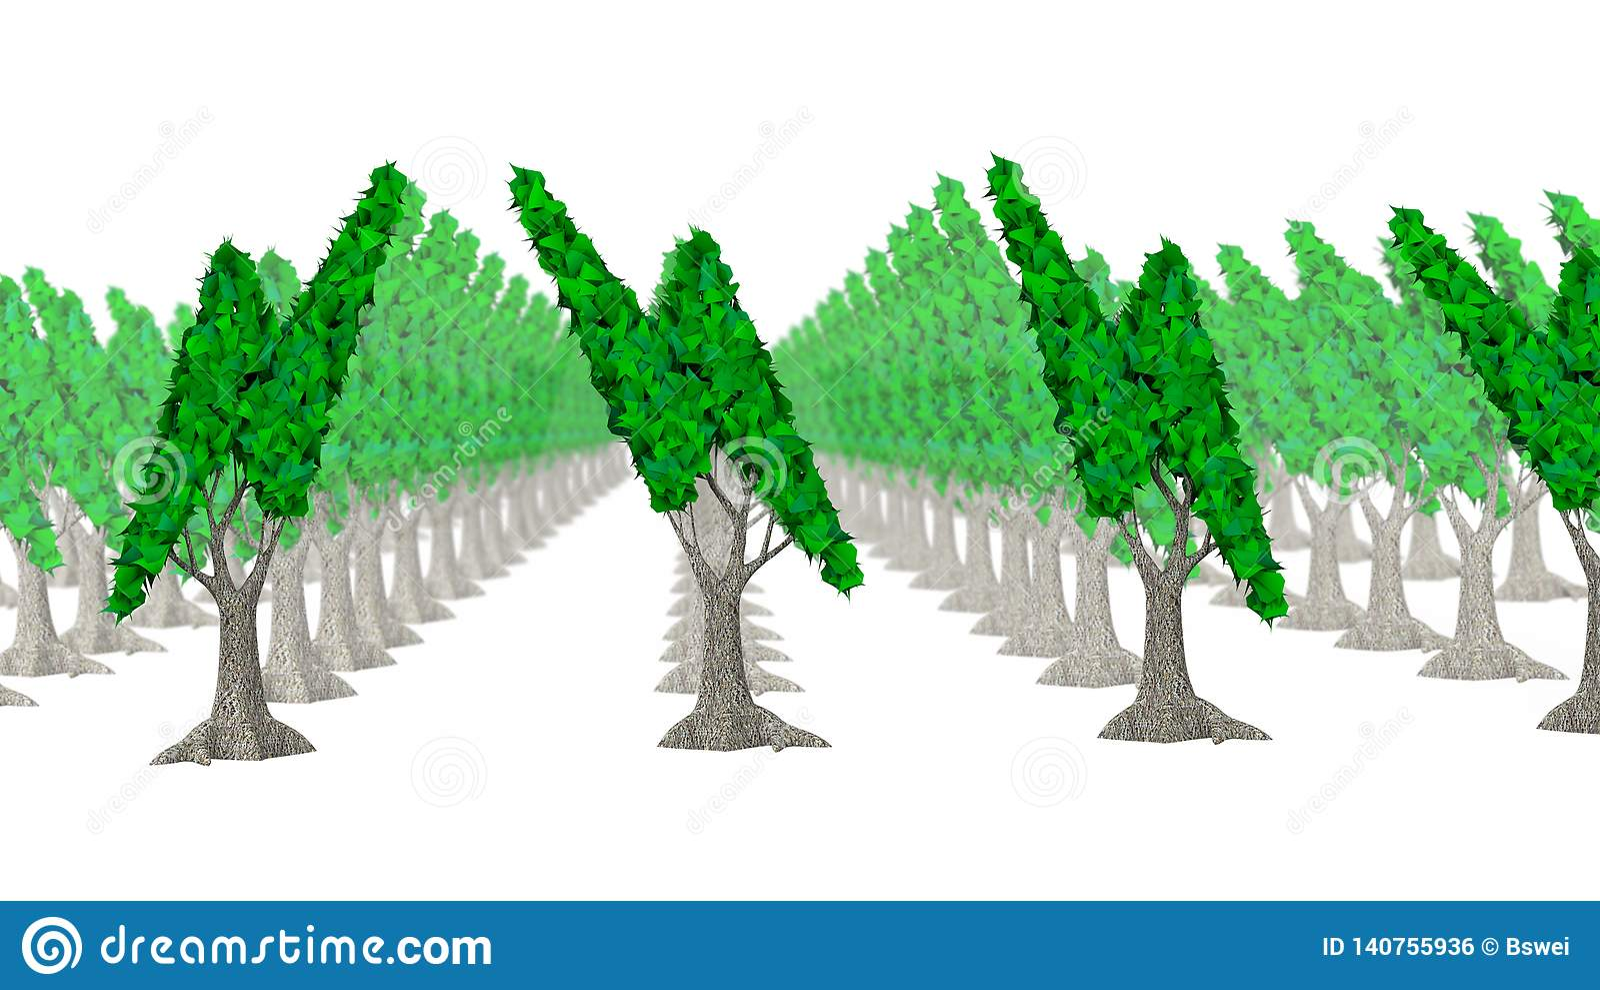 Trees With Leaves In Lightning Bolt Shape, 3D Illustration